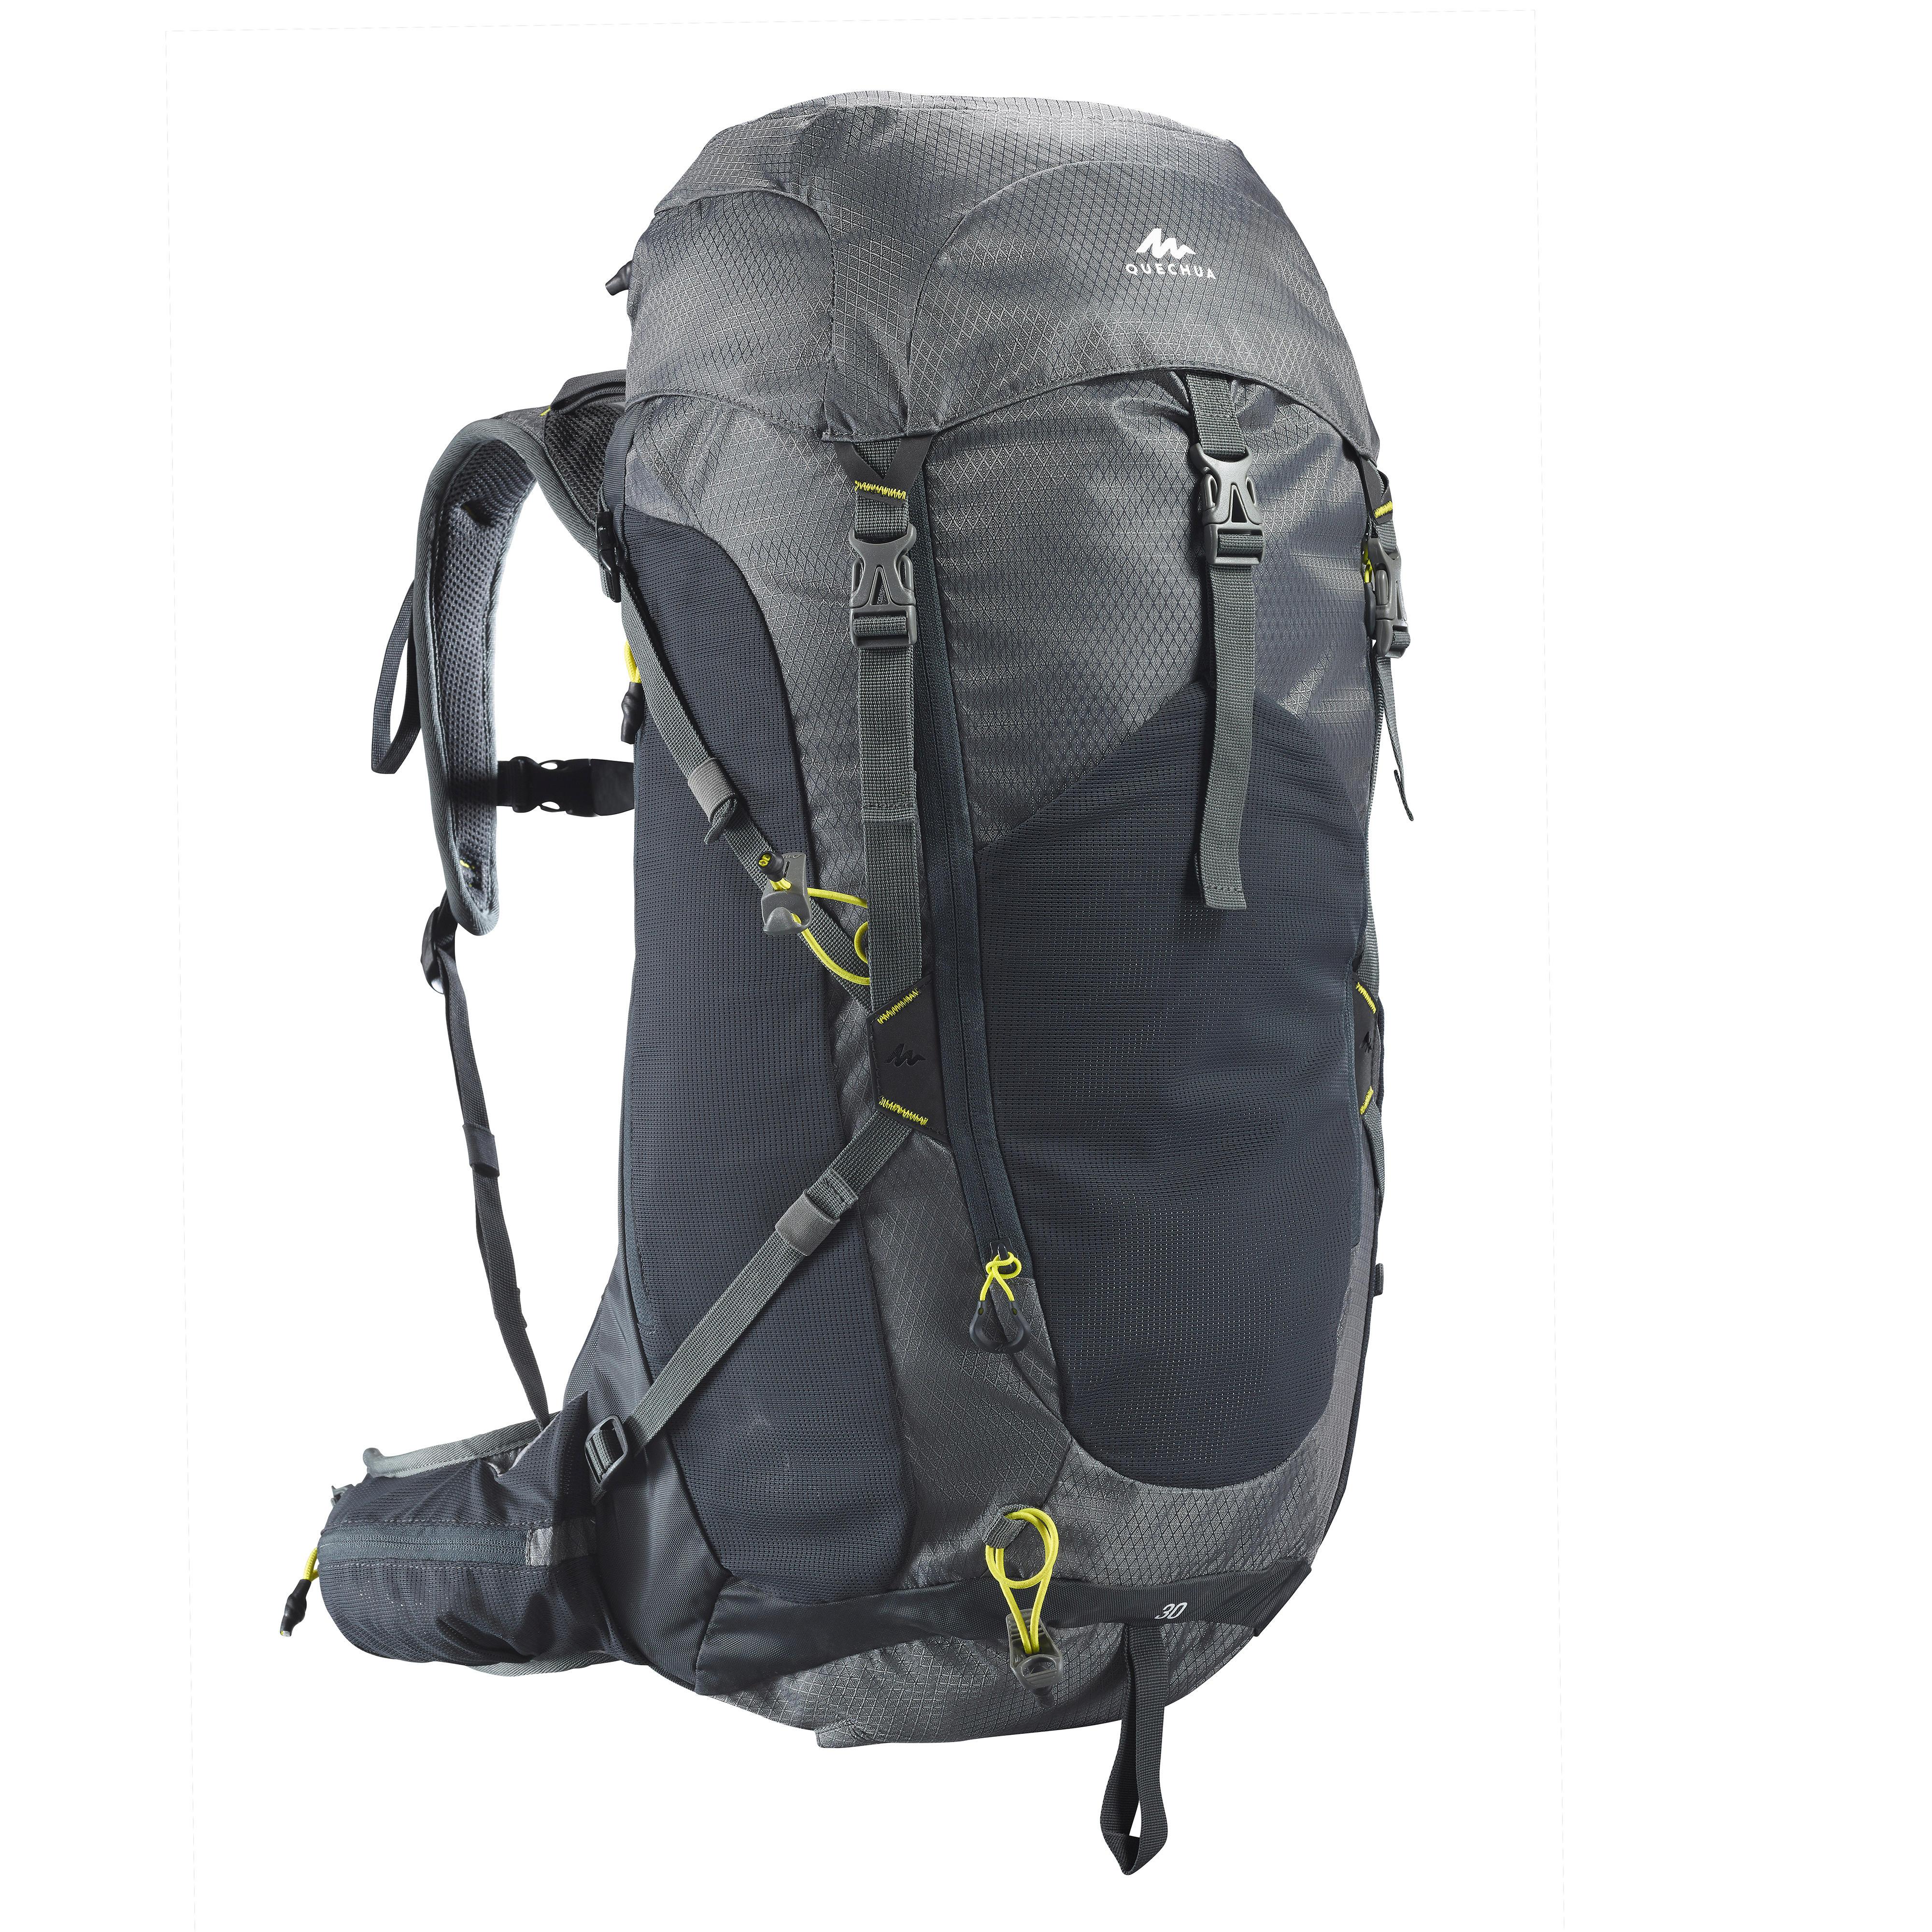 mochila para viajar decathlon 30 l